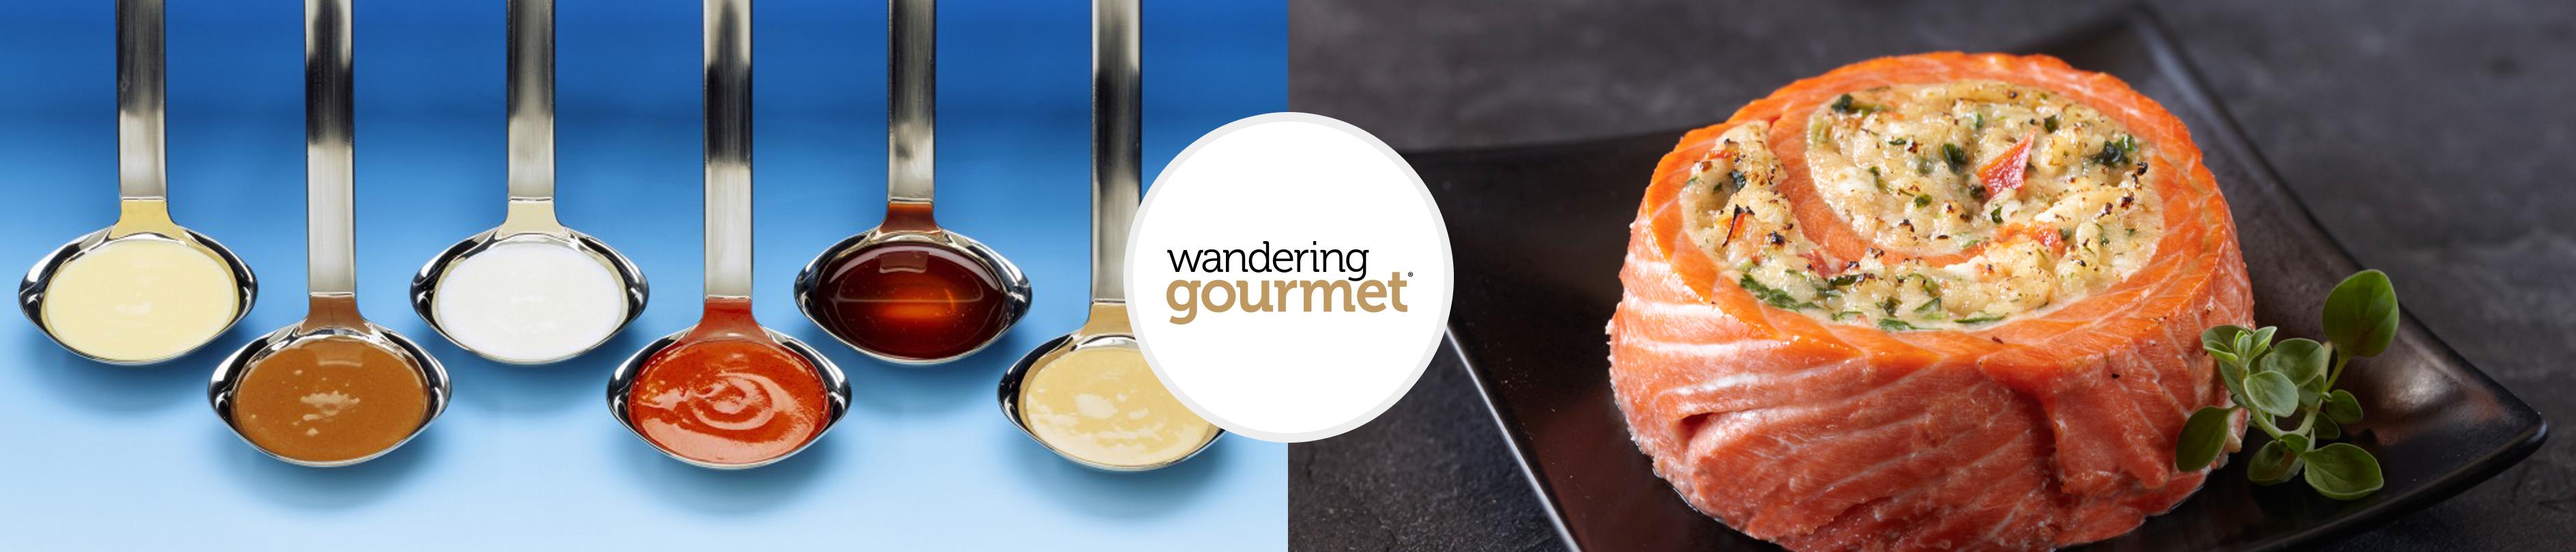 Wandering Gourmet